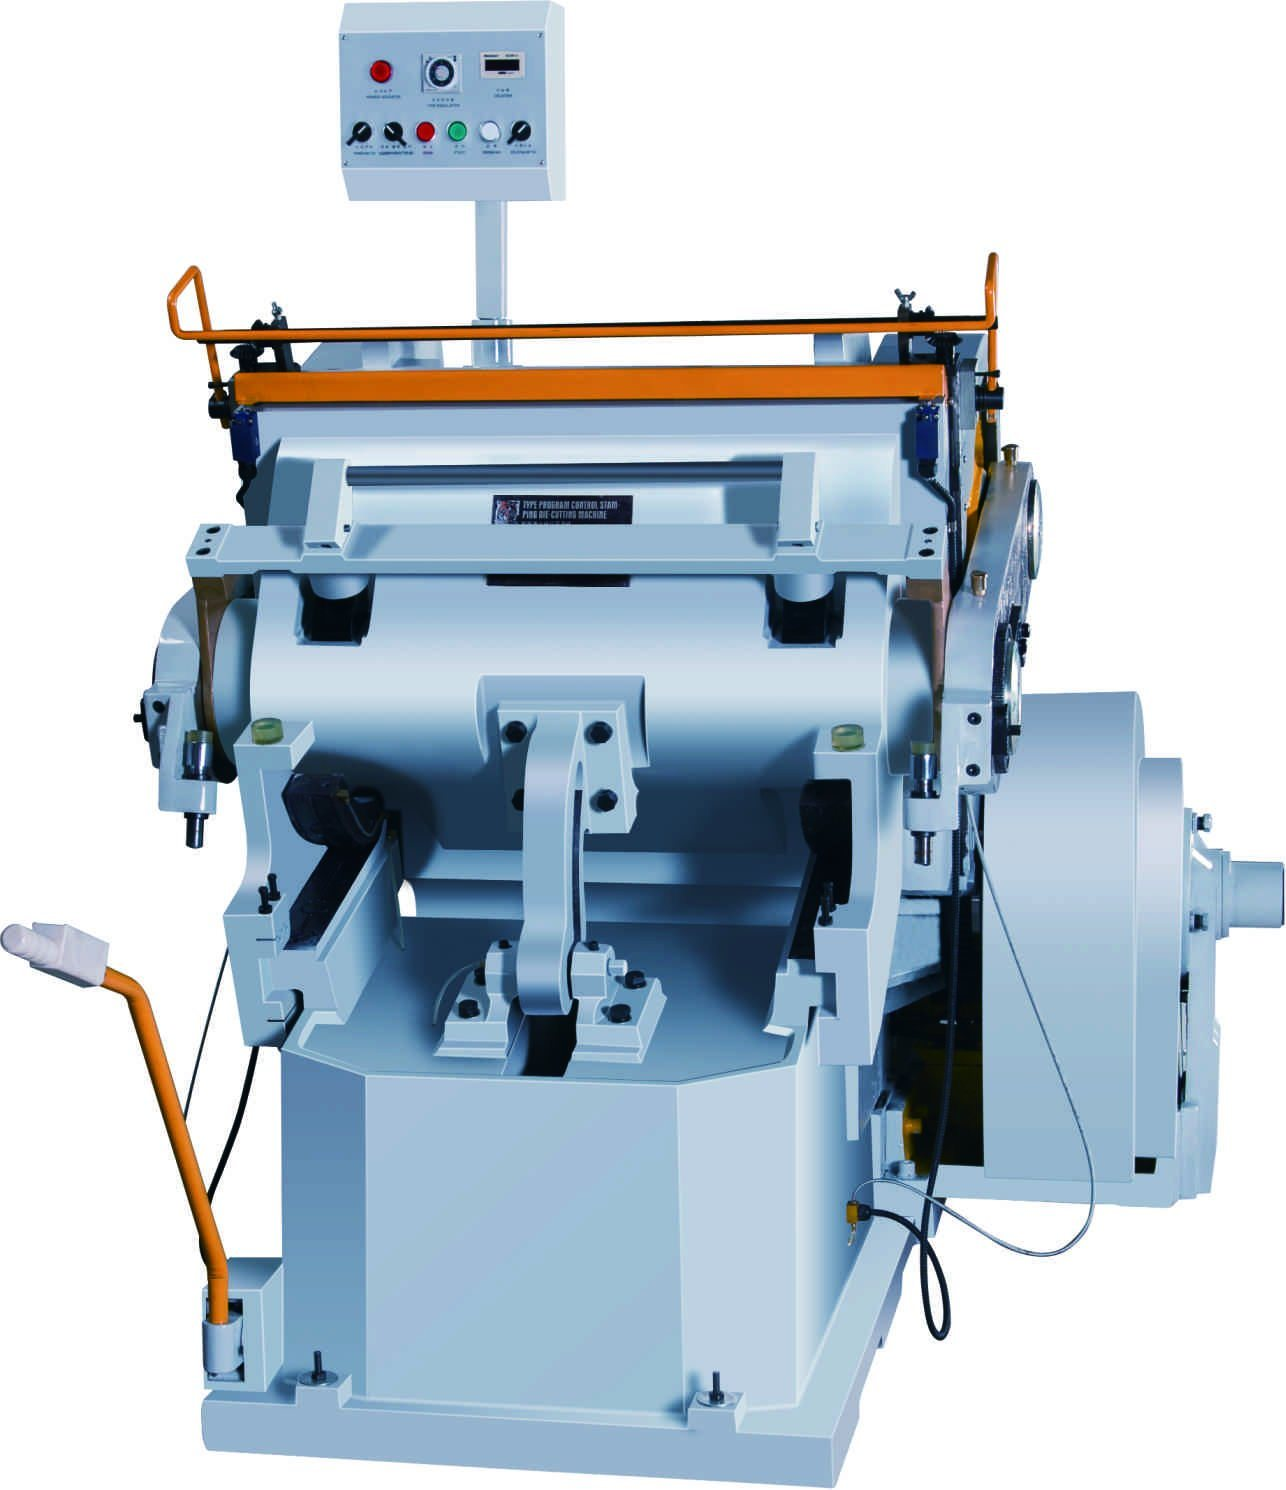 Ml-930X Heating Creasing and Die Cutting Machine